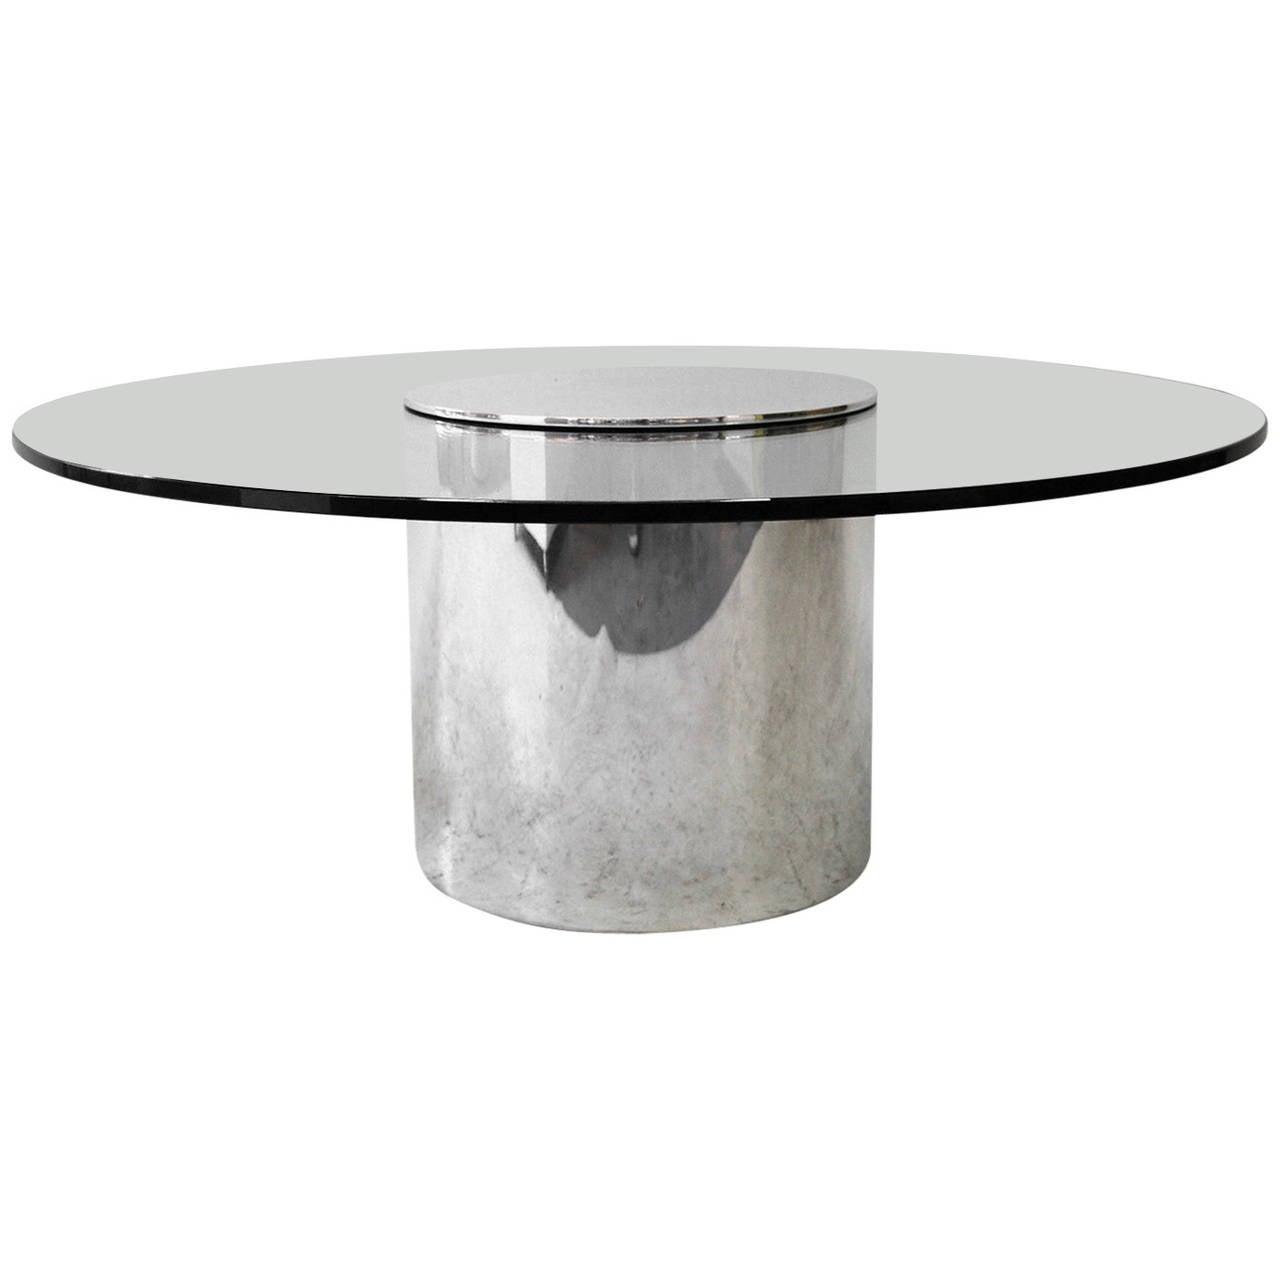 Paul mayen coffee table for habitat at 1stdibs paul mayen coffee table for habitat 1 geotapseo Gallery